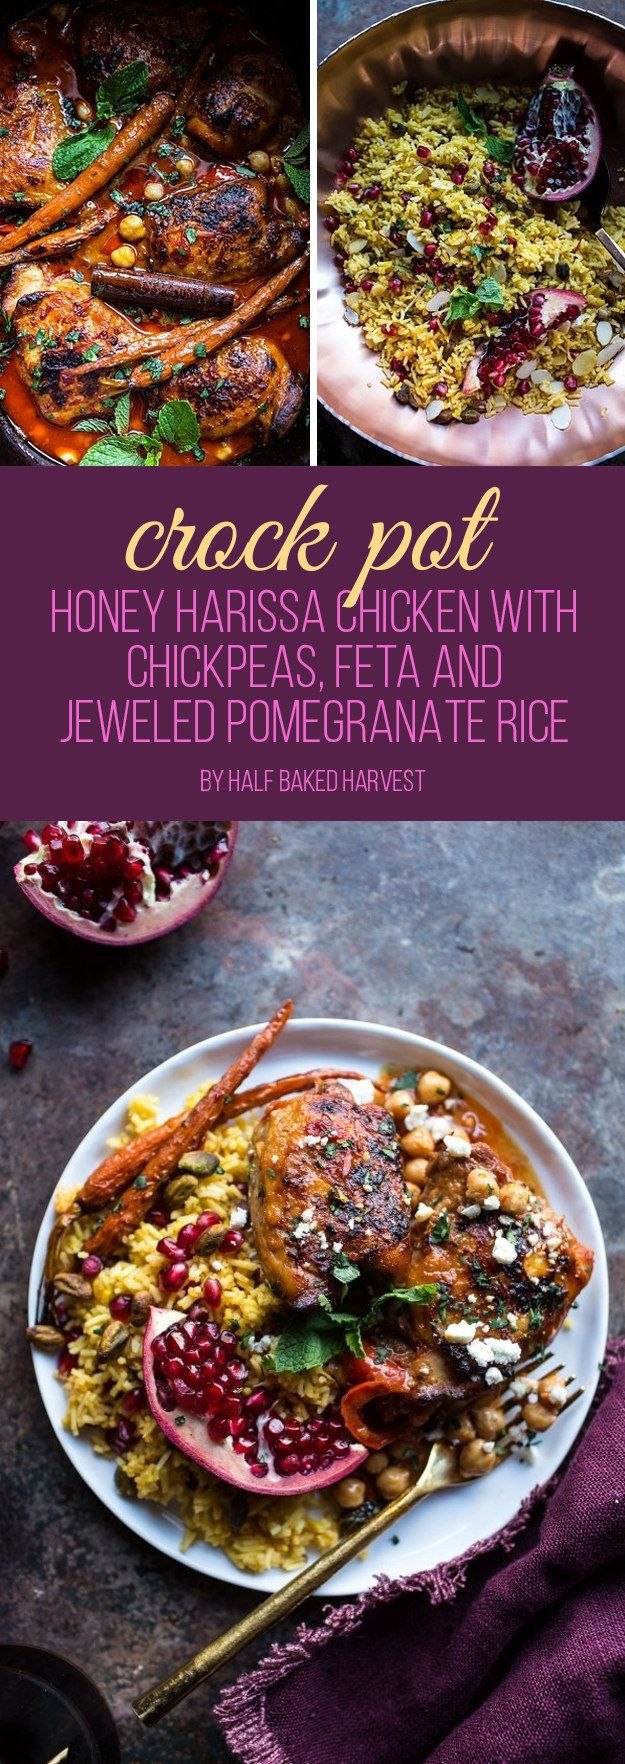 Crock Pot Honey Harissa Chicken with Chickpeas, Feta and Jeweled Pomegranate Rice